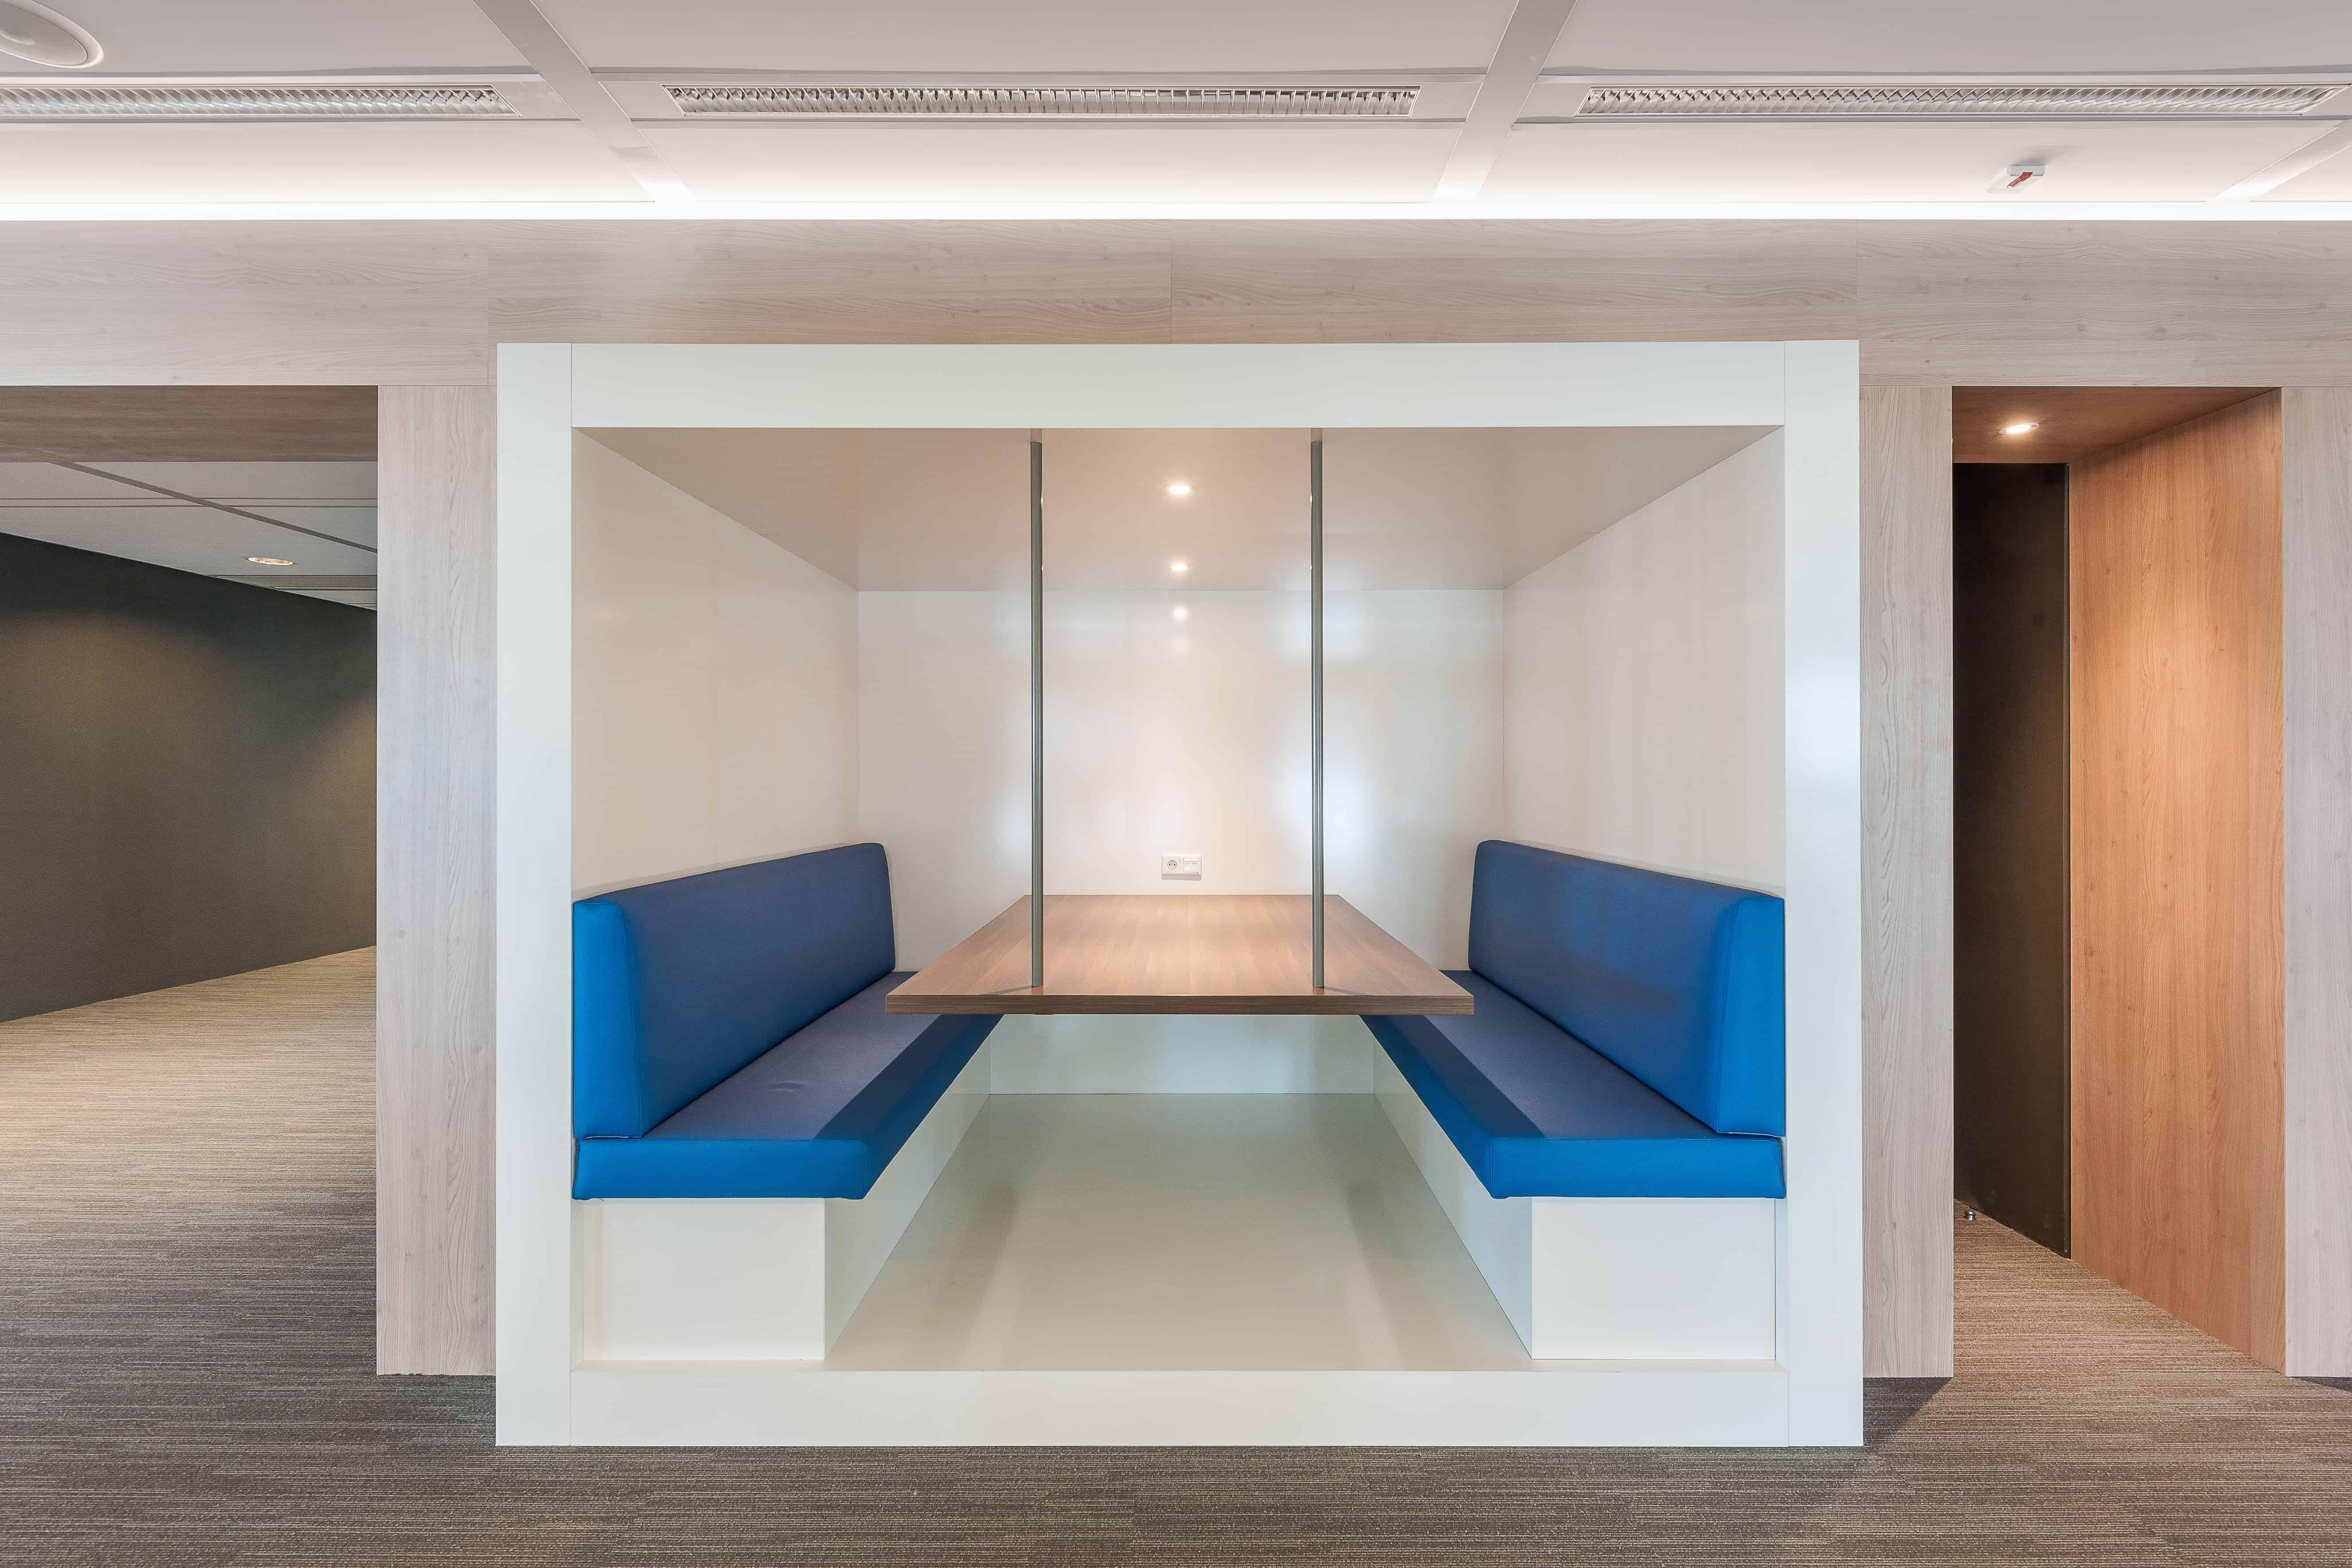 Omniplan Amsterdam Wildenberg interieurarchitectuur ontwerpt interieur kantoor overleg zithoek flexwerk